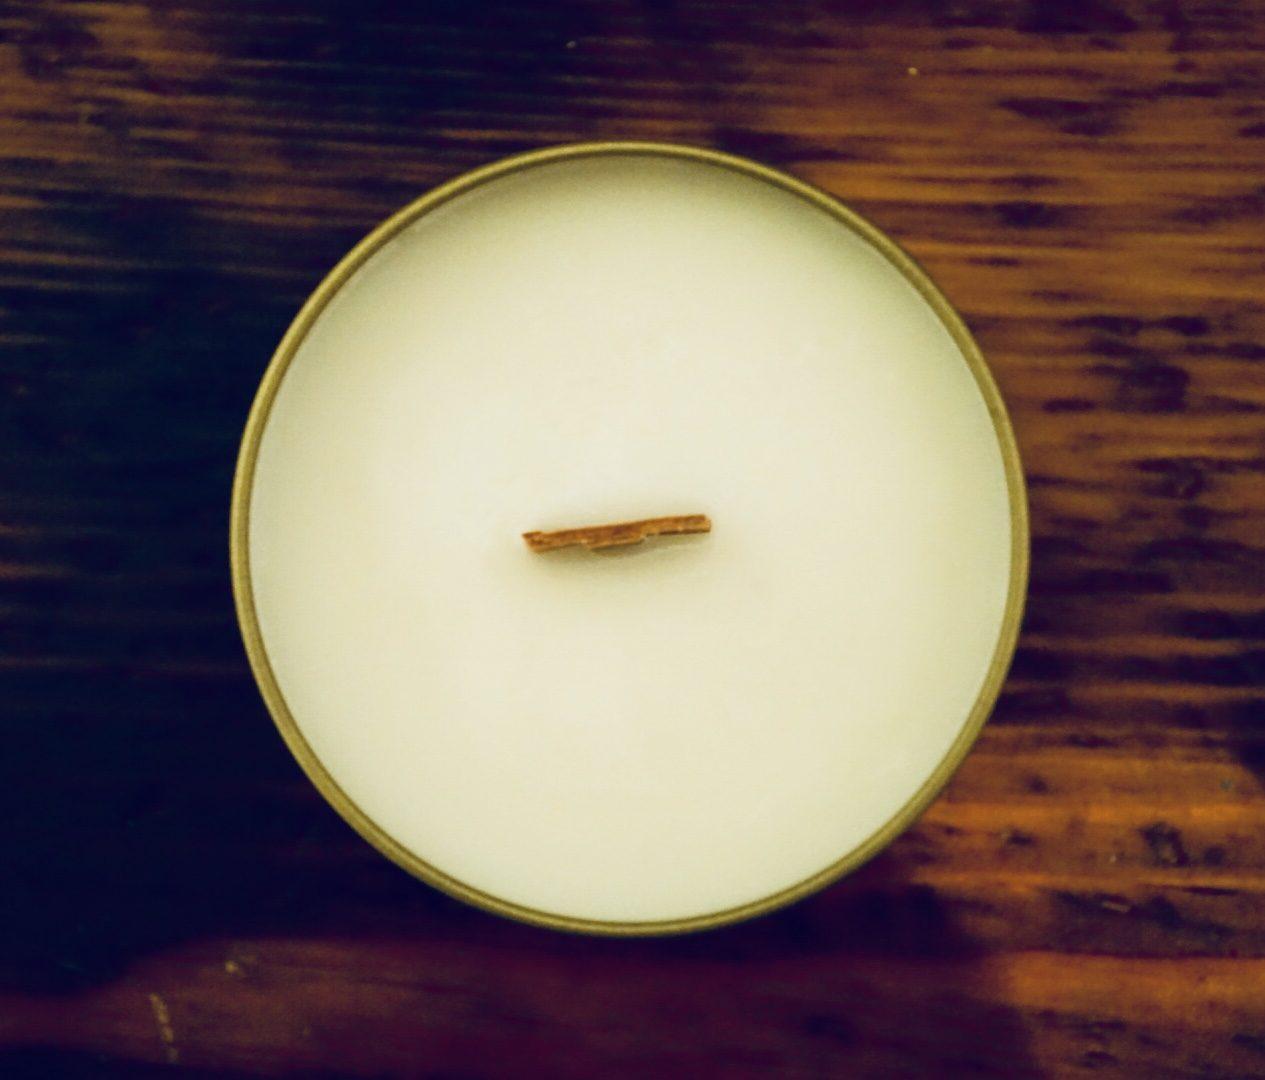 Remember, remember, have a fragrant November